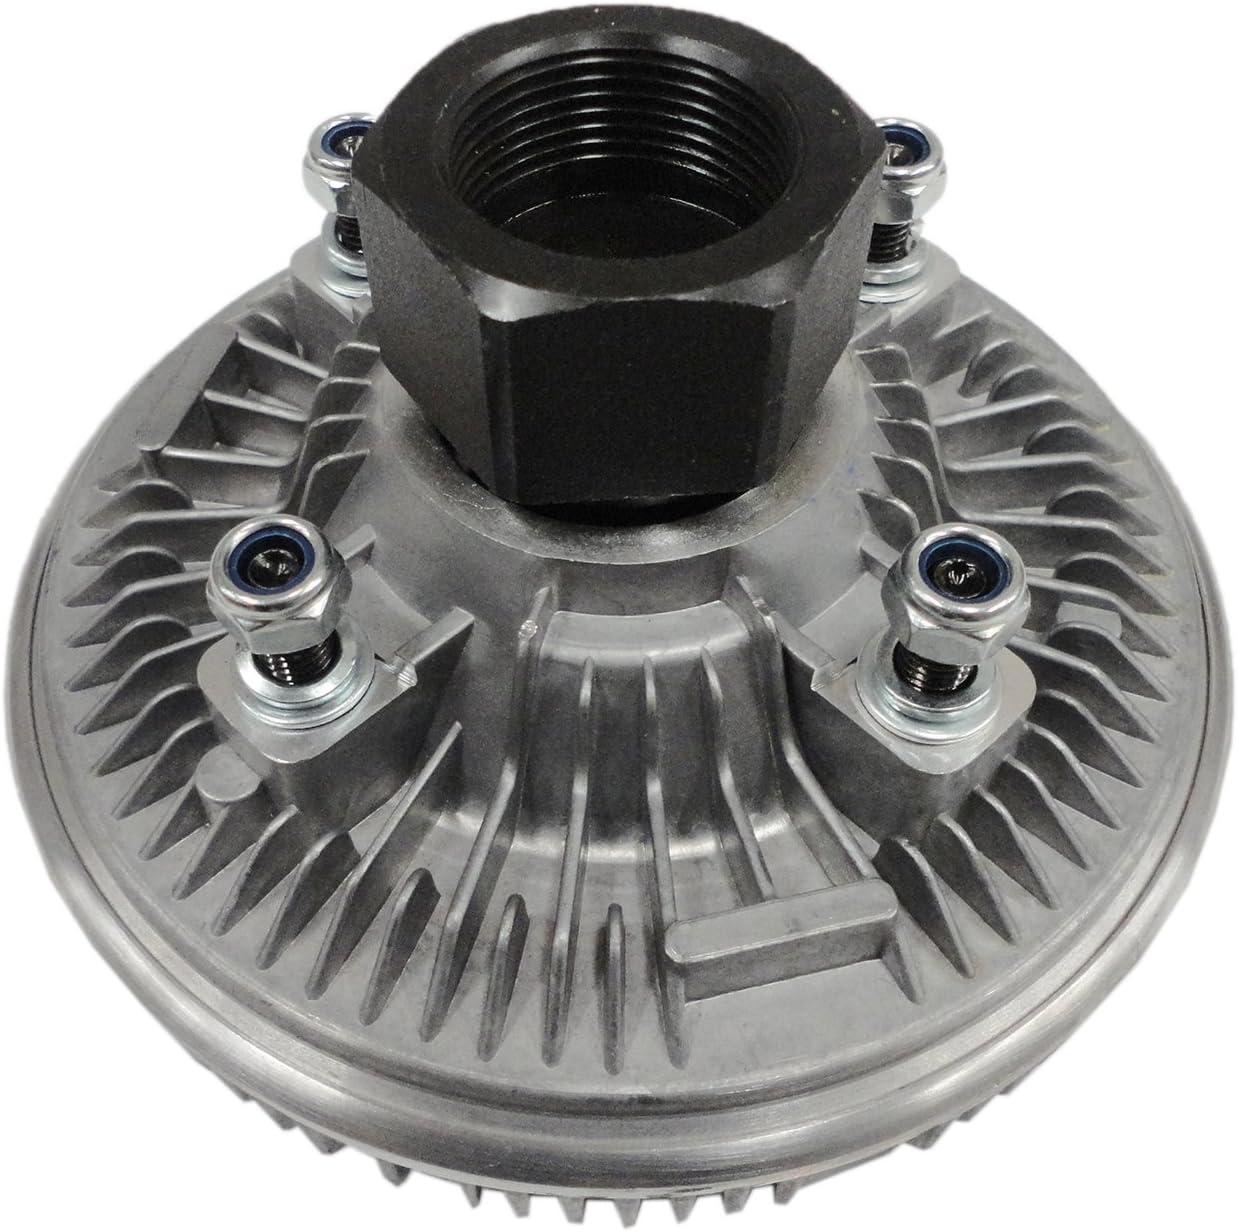 TOPAZ 2843 Engine Cooling Thermal Fan Clutch for 01-09 Chevrolet Express 2500 3500 GMC Savana 2500 3500 6.6L V8